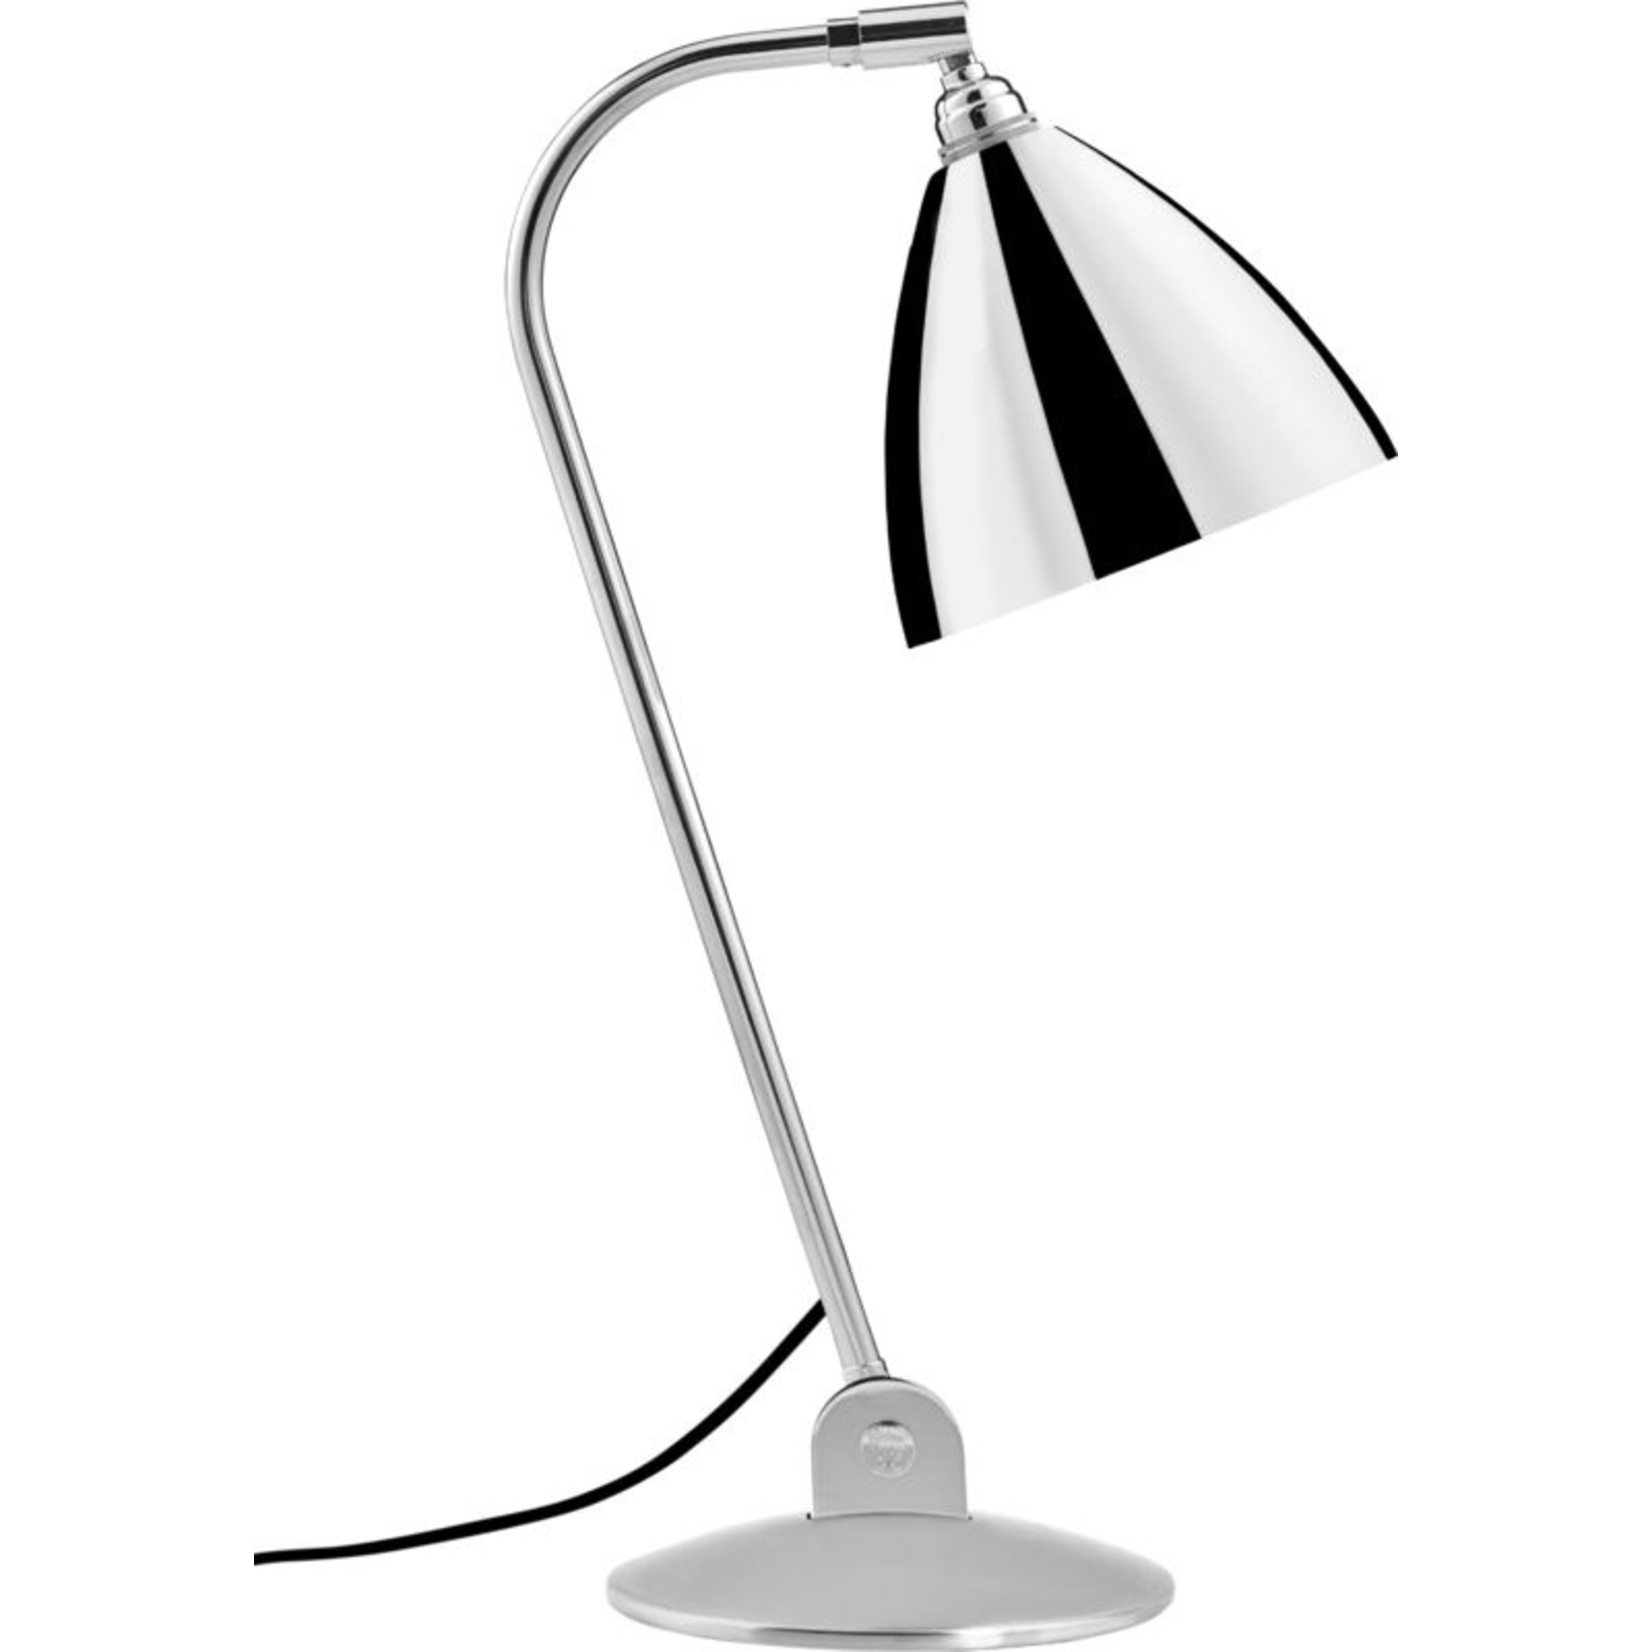 Gubi BL2 Table Lamp - Ø16 | Chrome Base & Chrome Shade